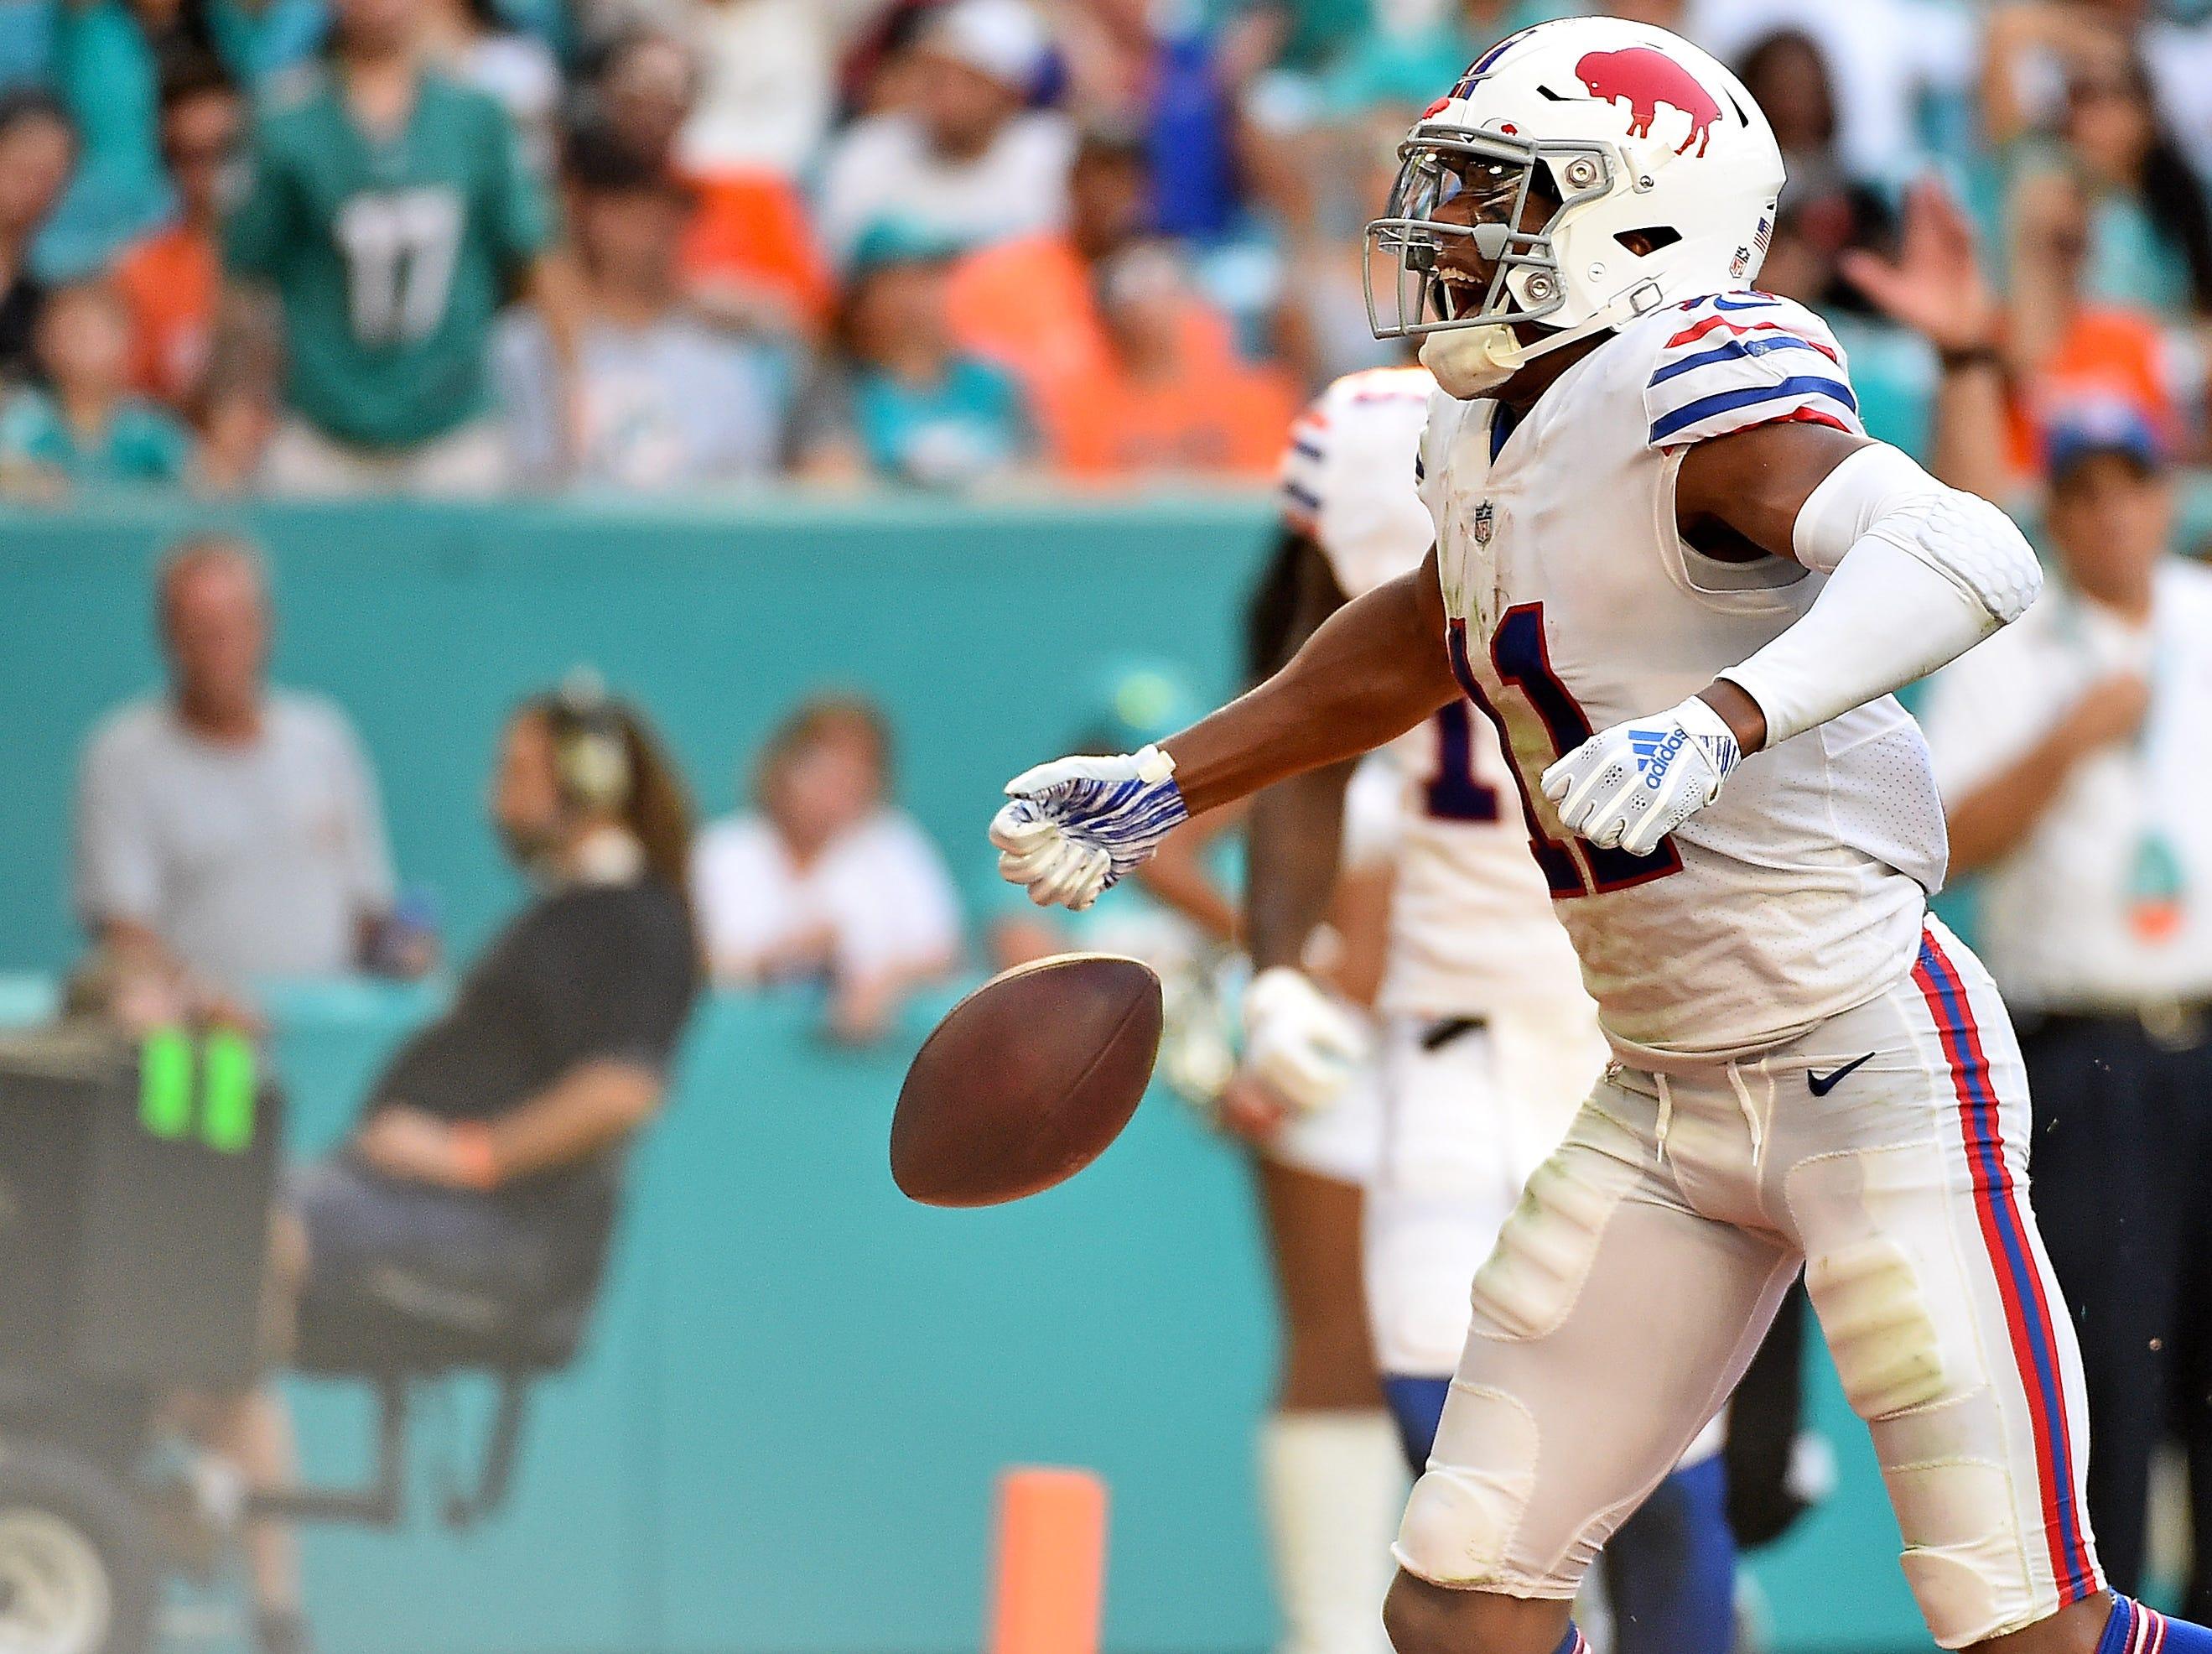 Dec 2, 2018; Miami Gardens, FL, USA; Buffalo Bills wide receiver Zay Jones (11) celebrates his touchdown against the Miami Dolphins during the second half at Hard Rock Stadium. Mandatory Credit: Jasen Vinlove-USA TODAY Sports